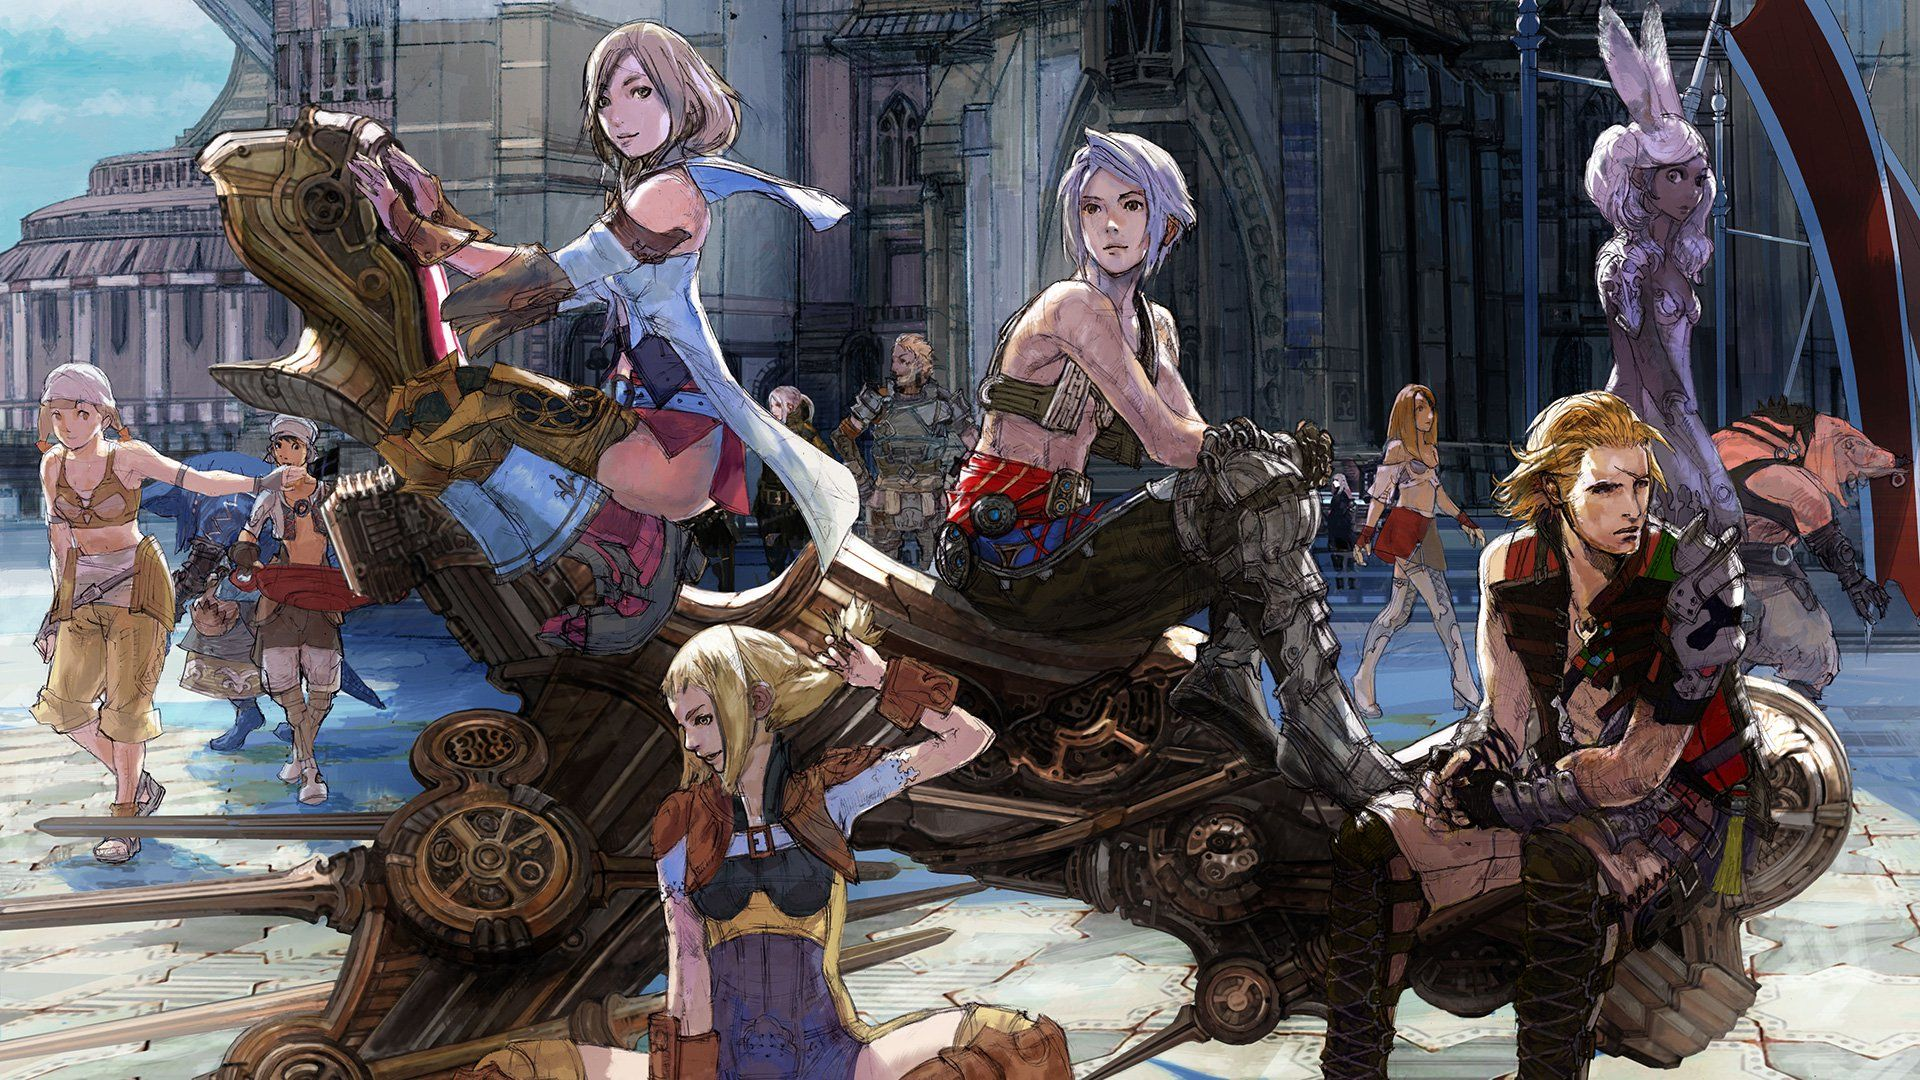 Final Fantasy 12 Wallpaper 1920x1080